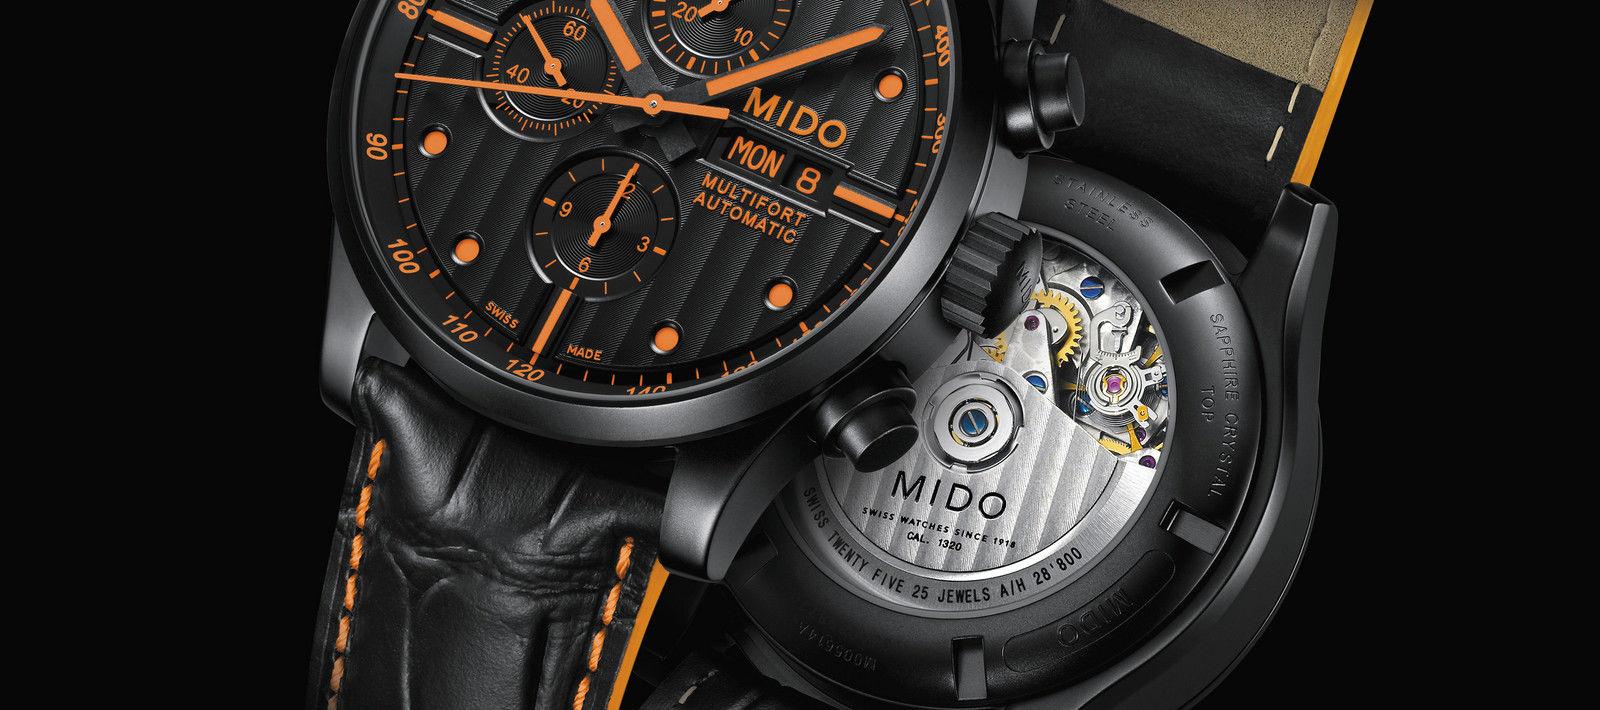 dda0e8864ca Mido Multifort M005.614.36.051.22 Special Edition + náhradní řemínek ...